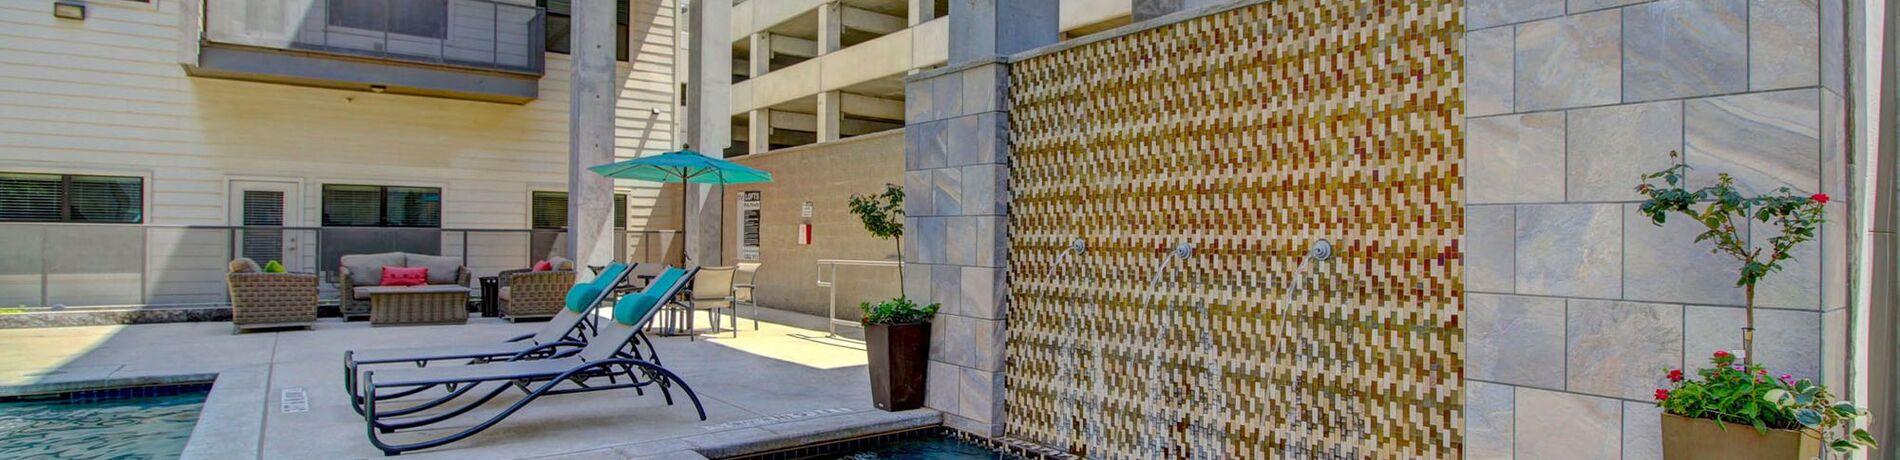 Apts for Rent Midland, TX | Wall Street Lofts Neighborhood